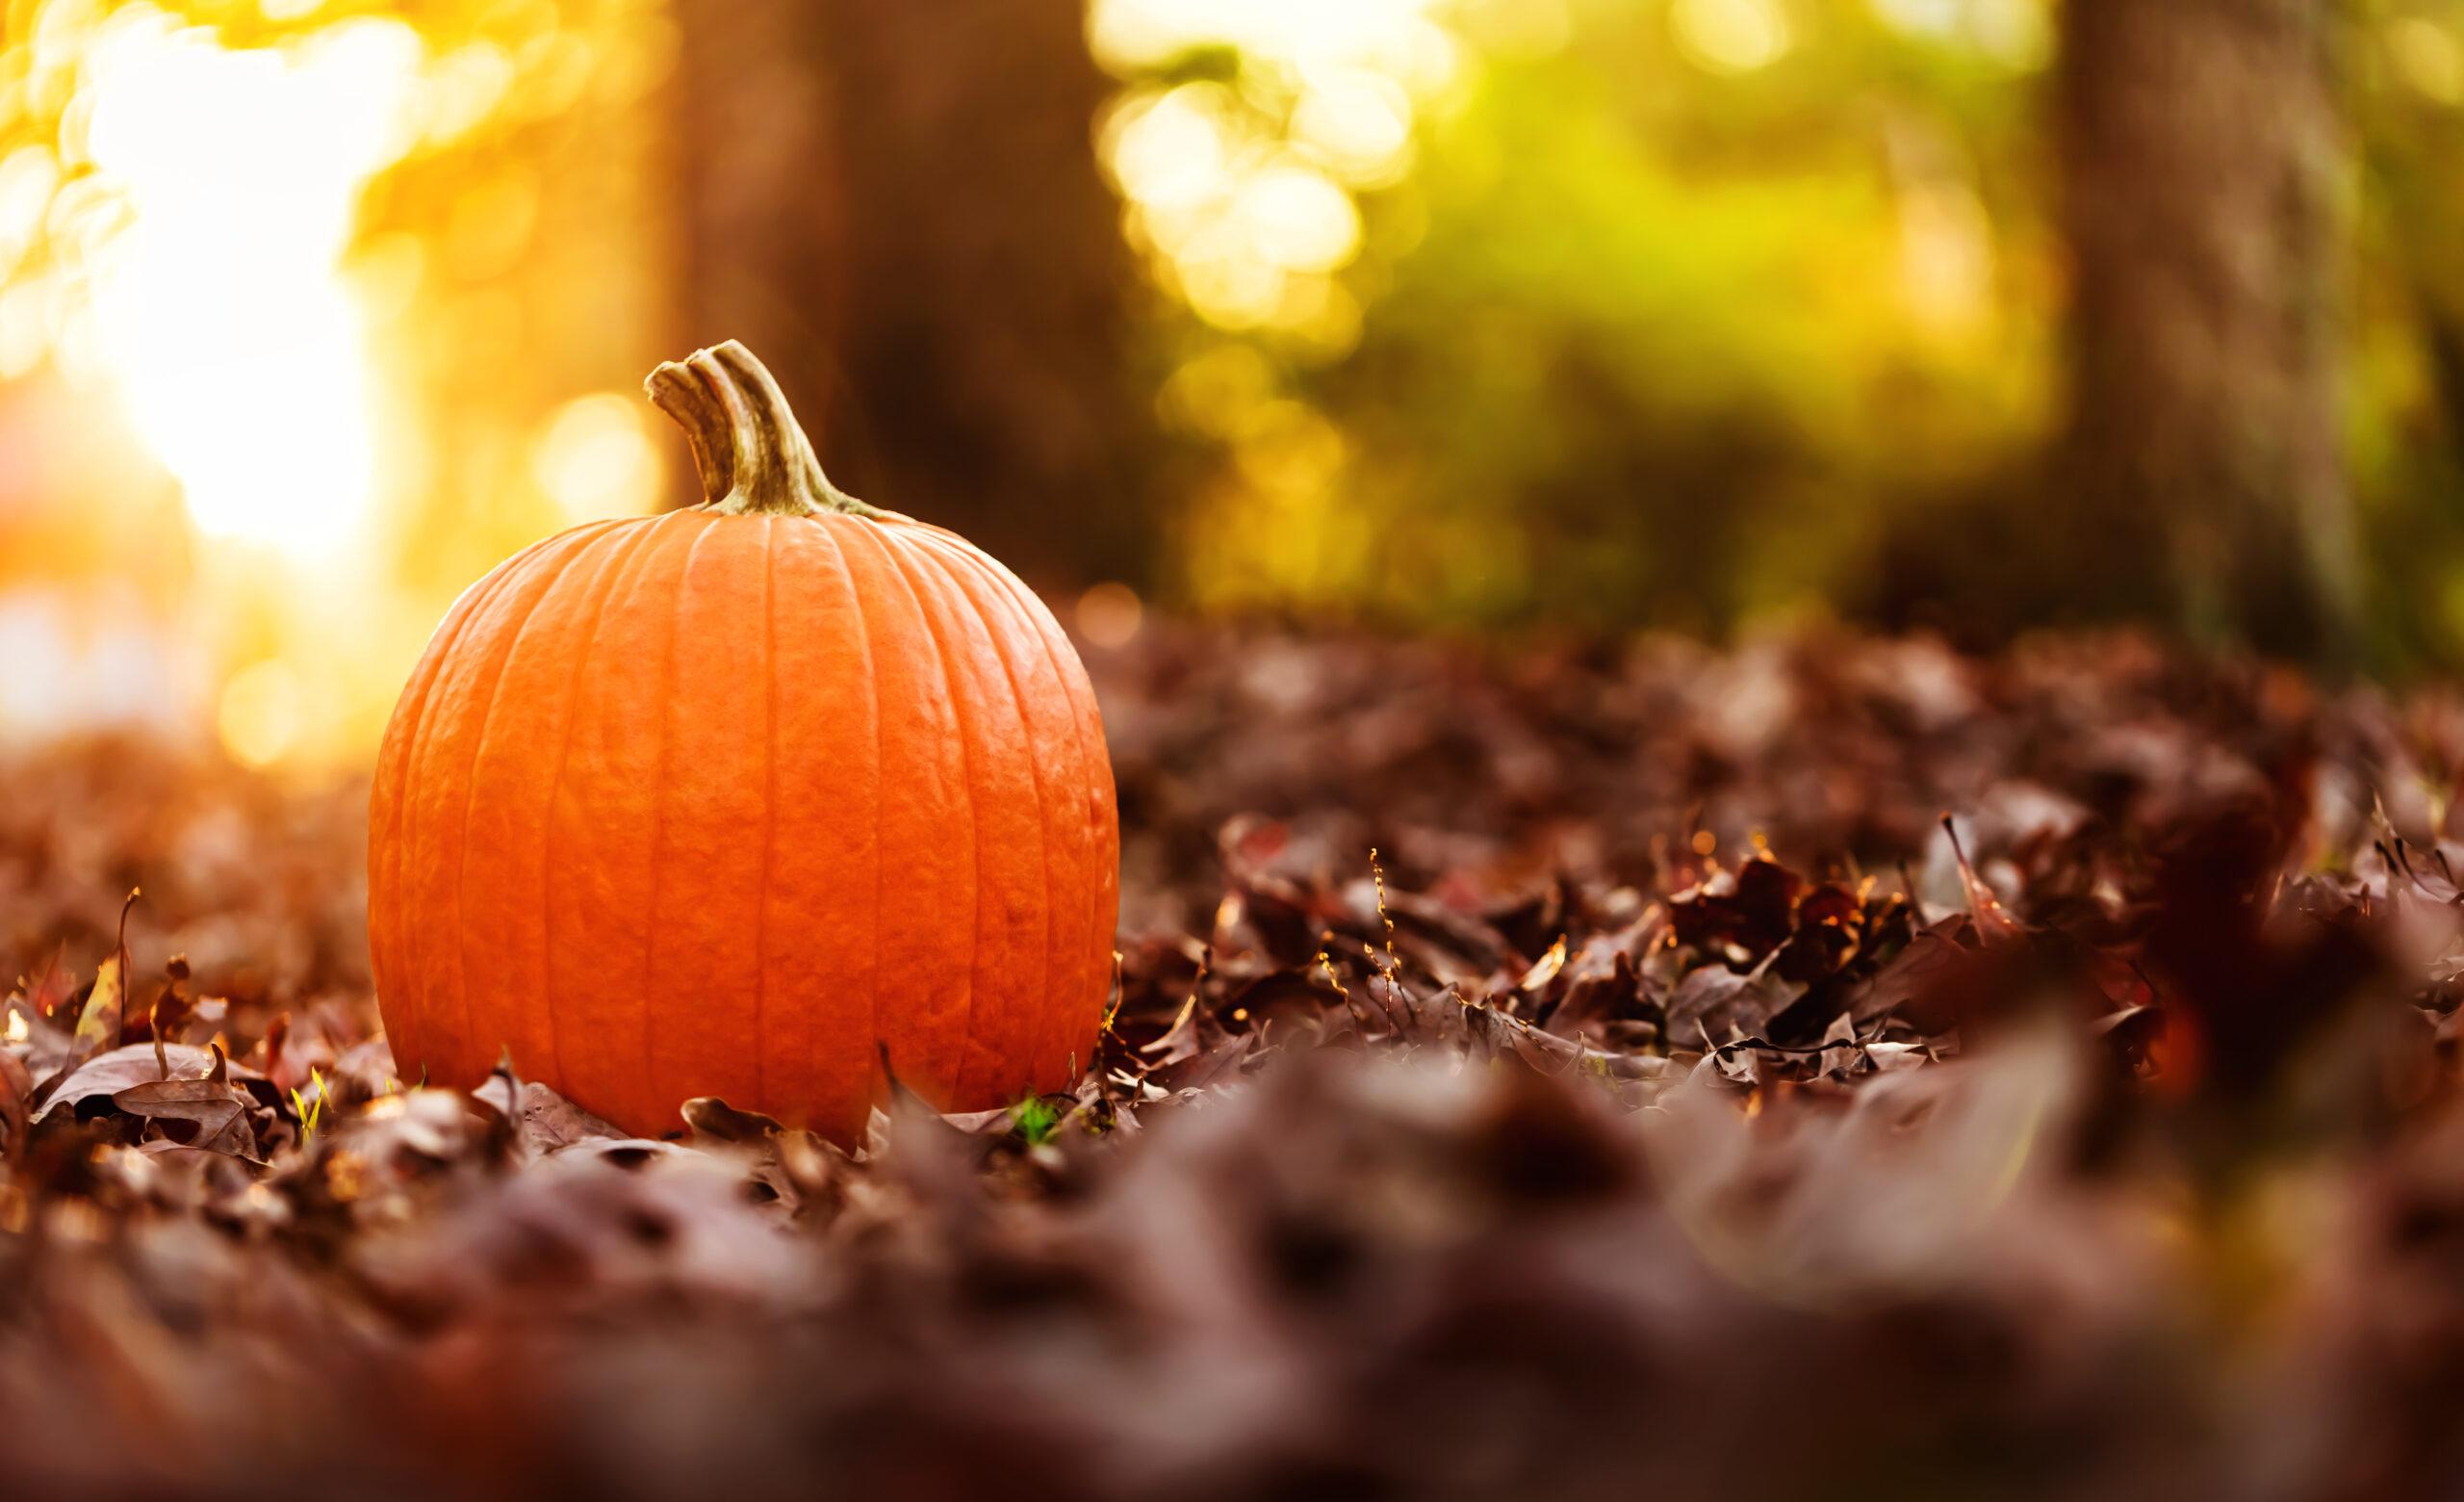 hocus pocus filming locations in salem ma - Big orange pumpkin with autumn leaves at sunset